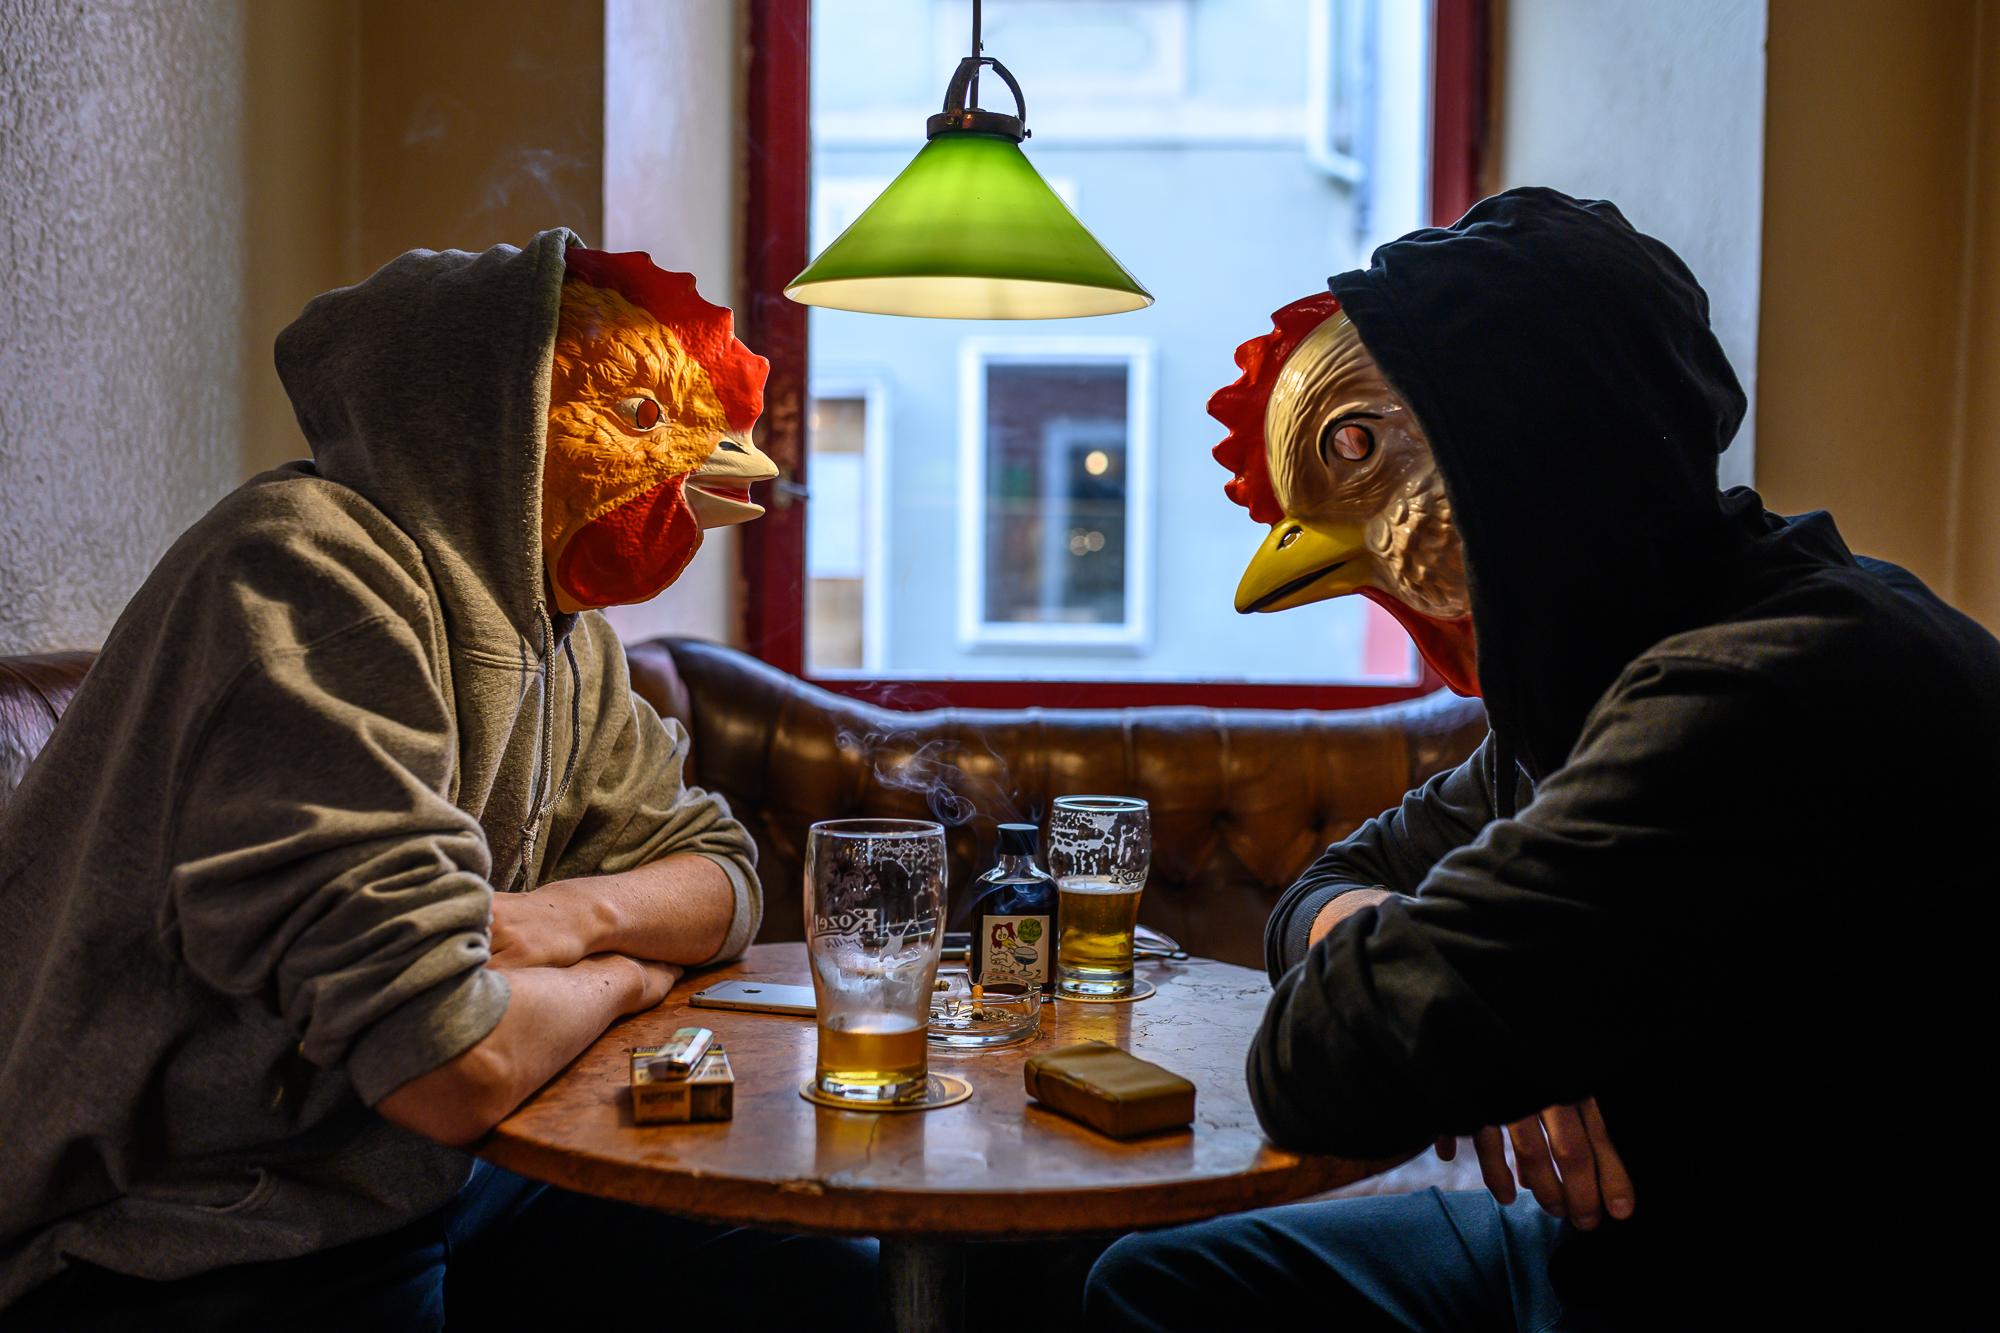 Huhnmensch